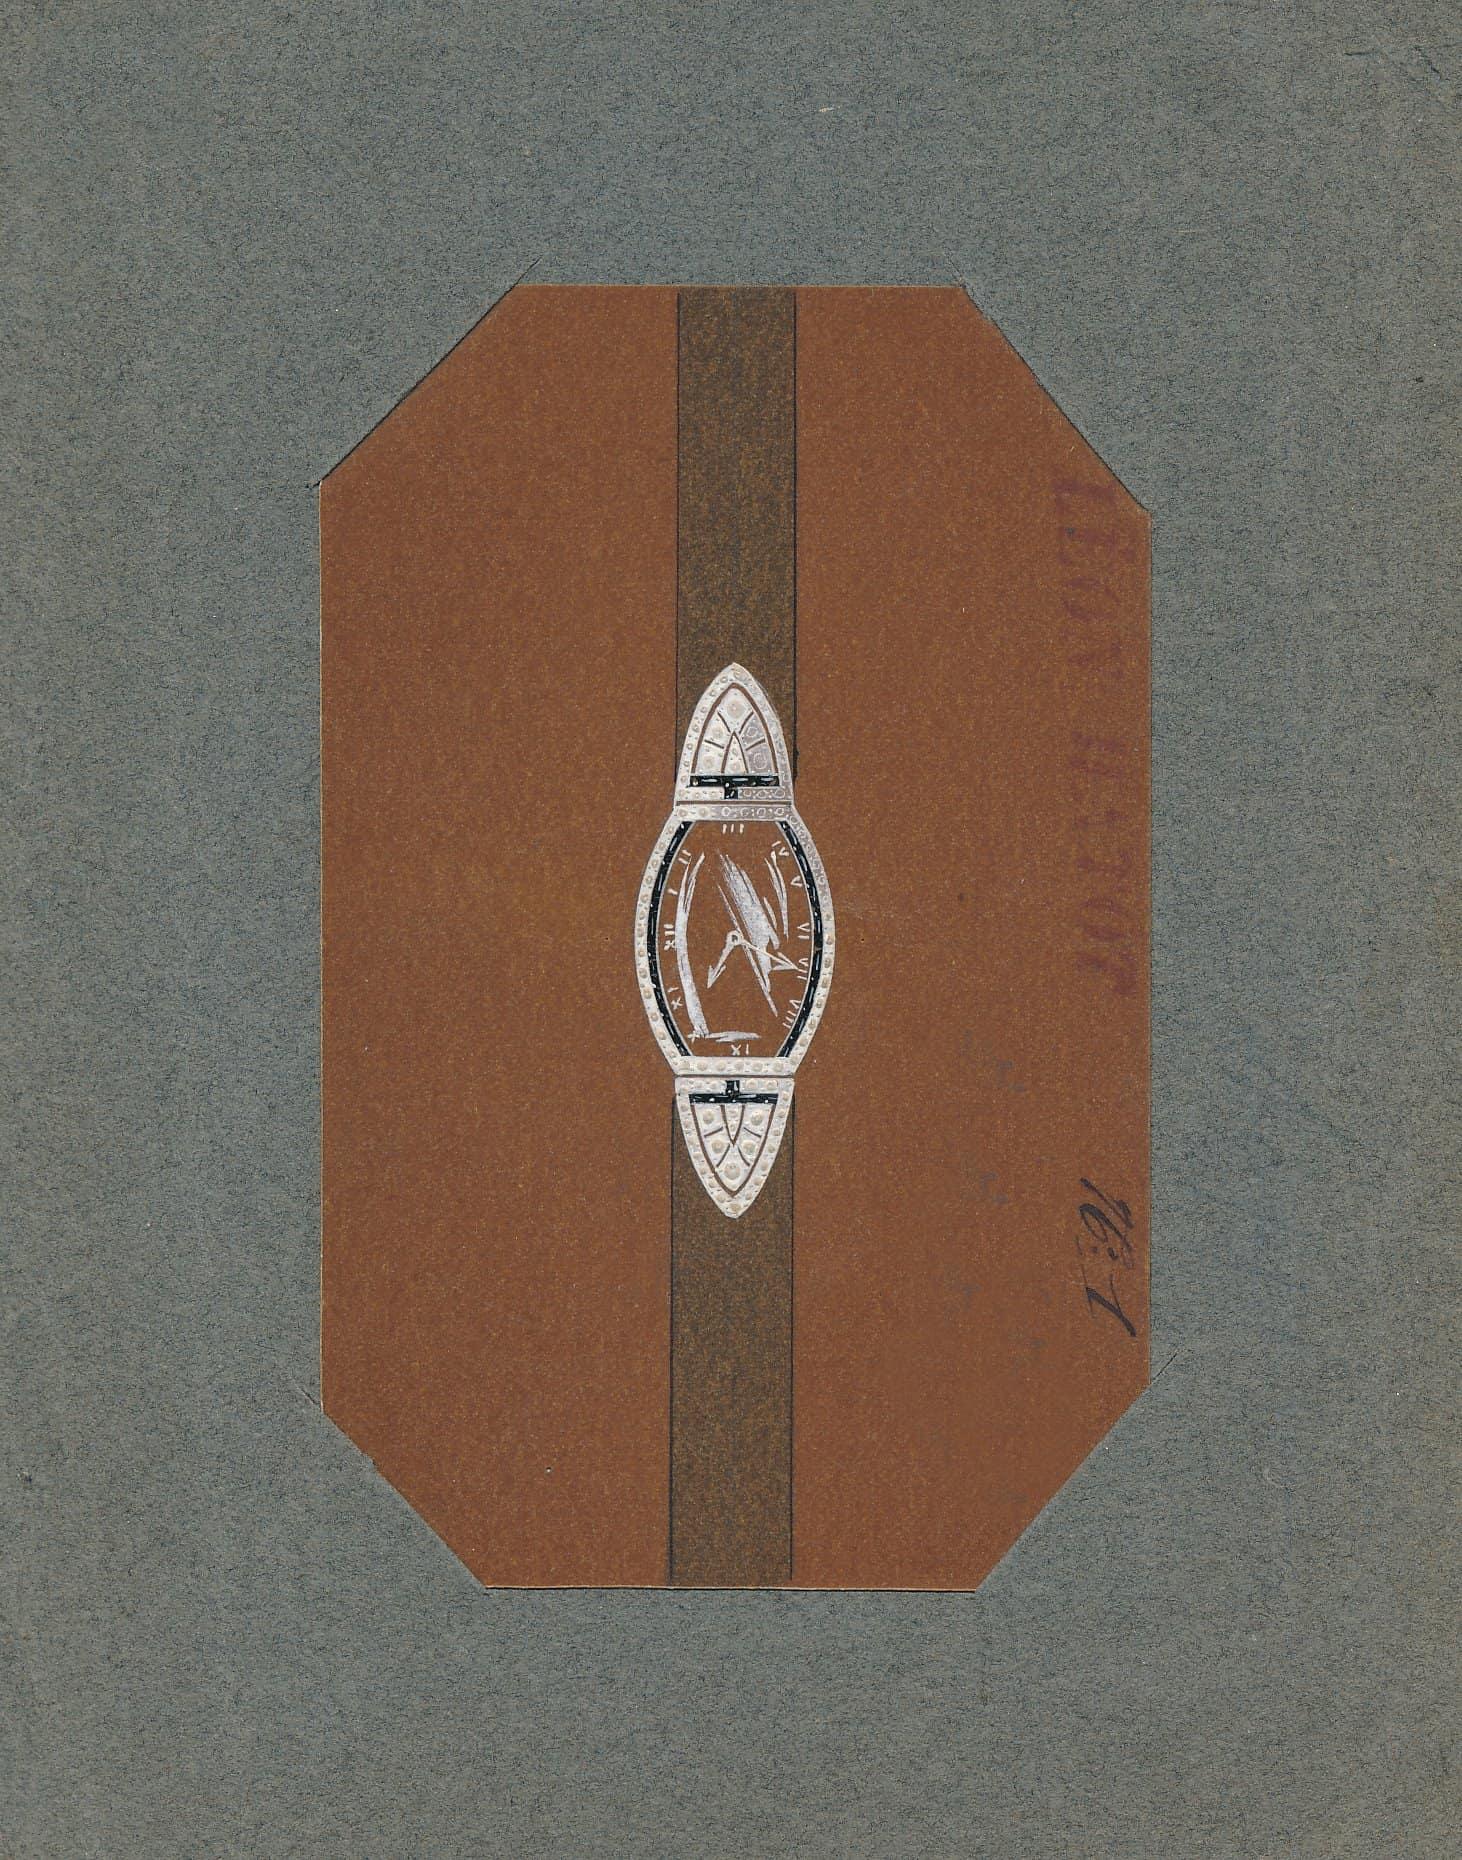 Armbanduhrendesign Léon Hatot 1921